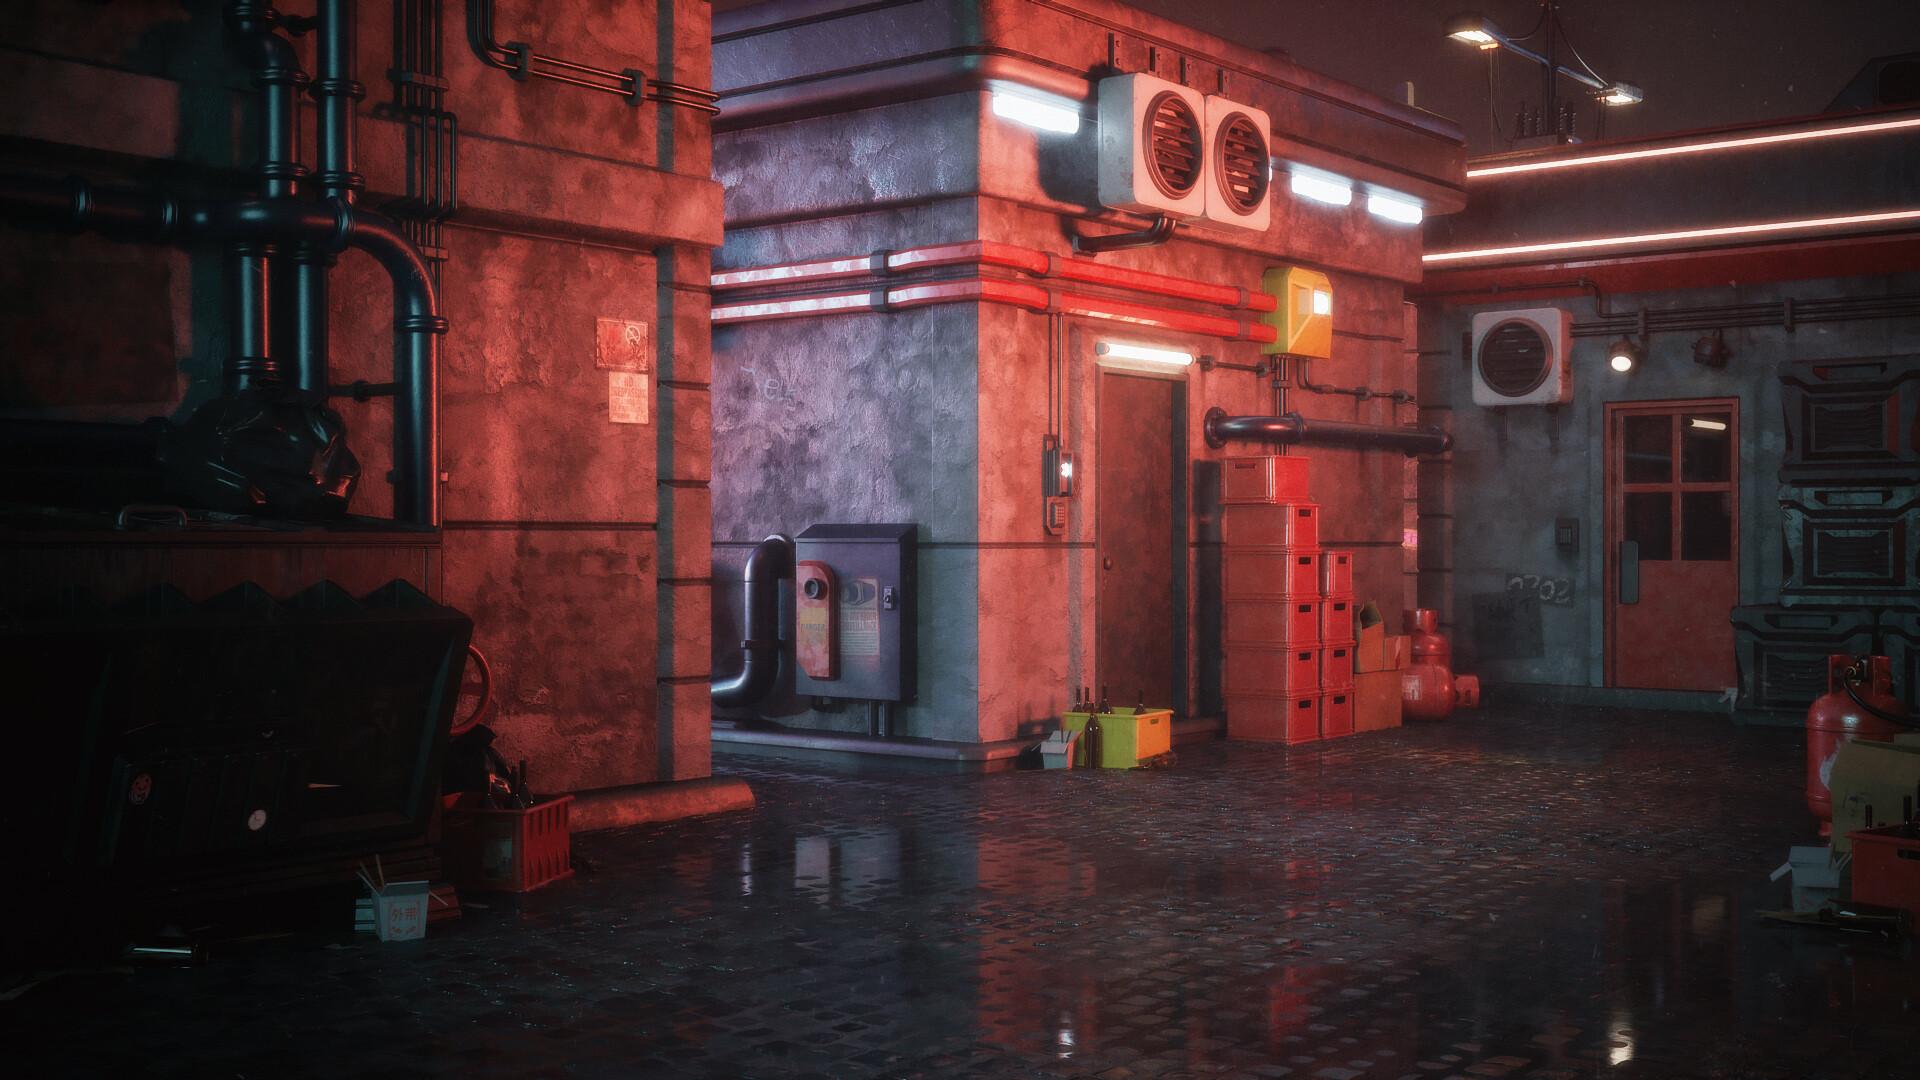 ArtStation - Kitbash3d Cyber Streets, Mike Golden